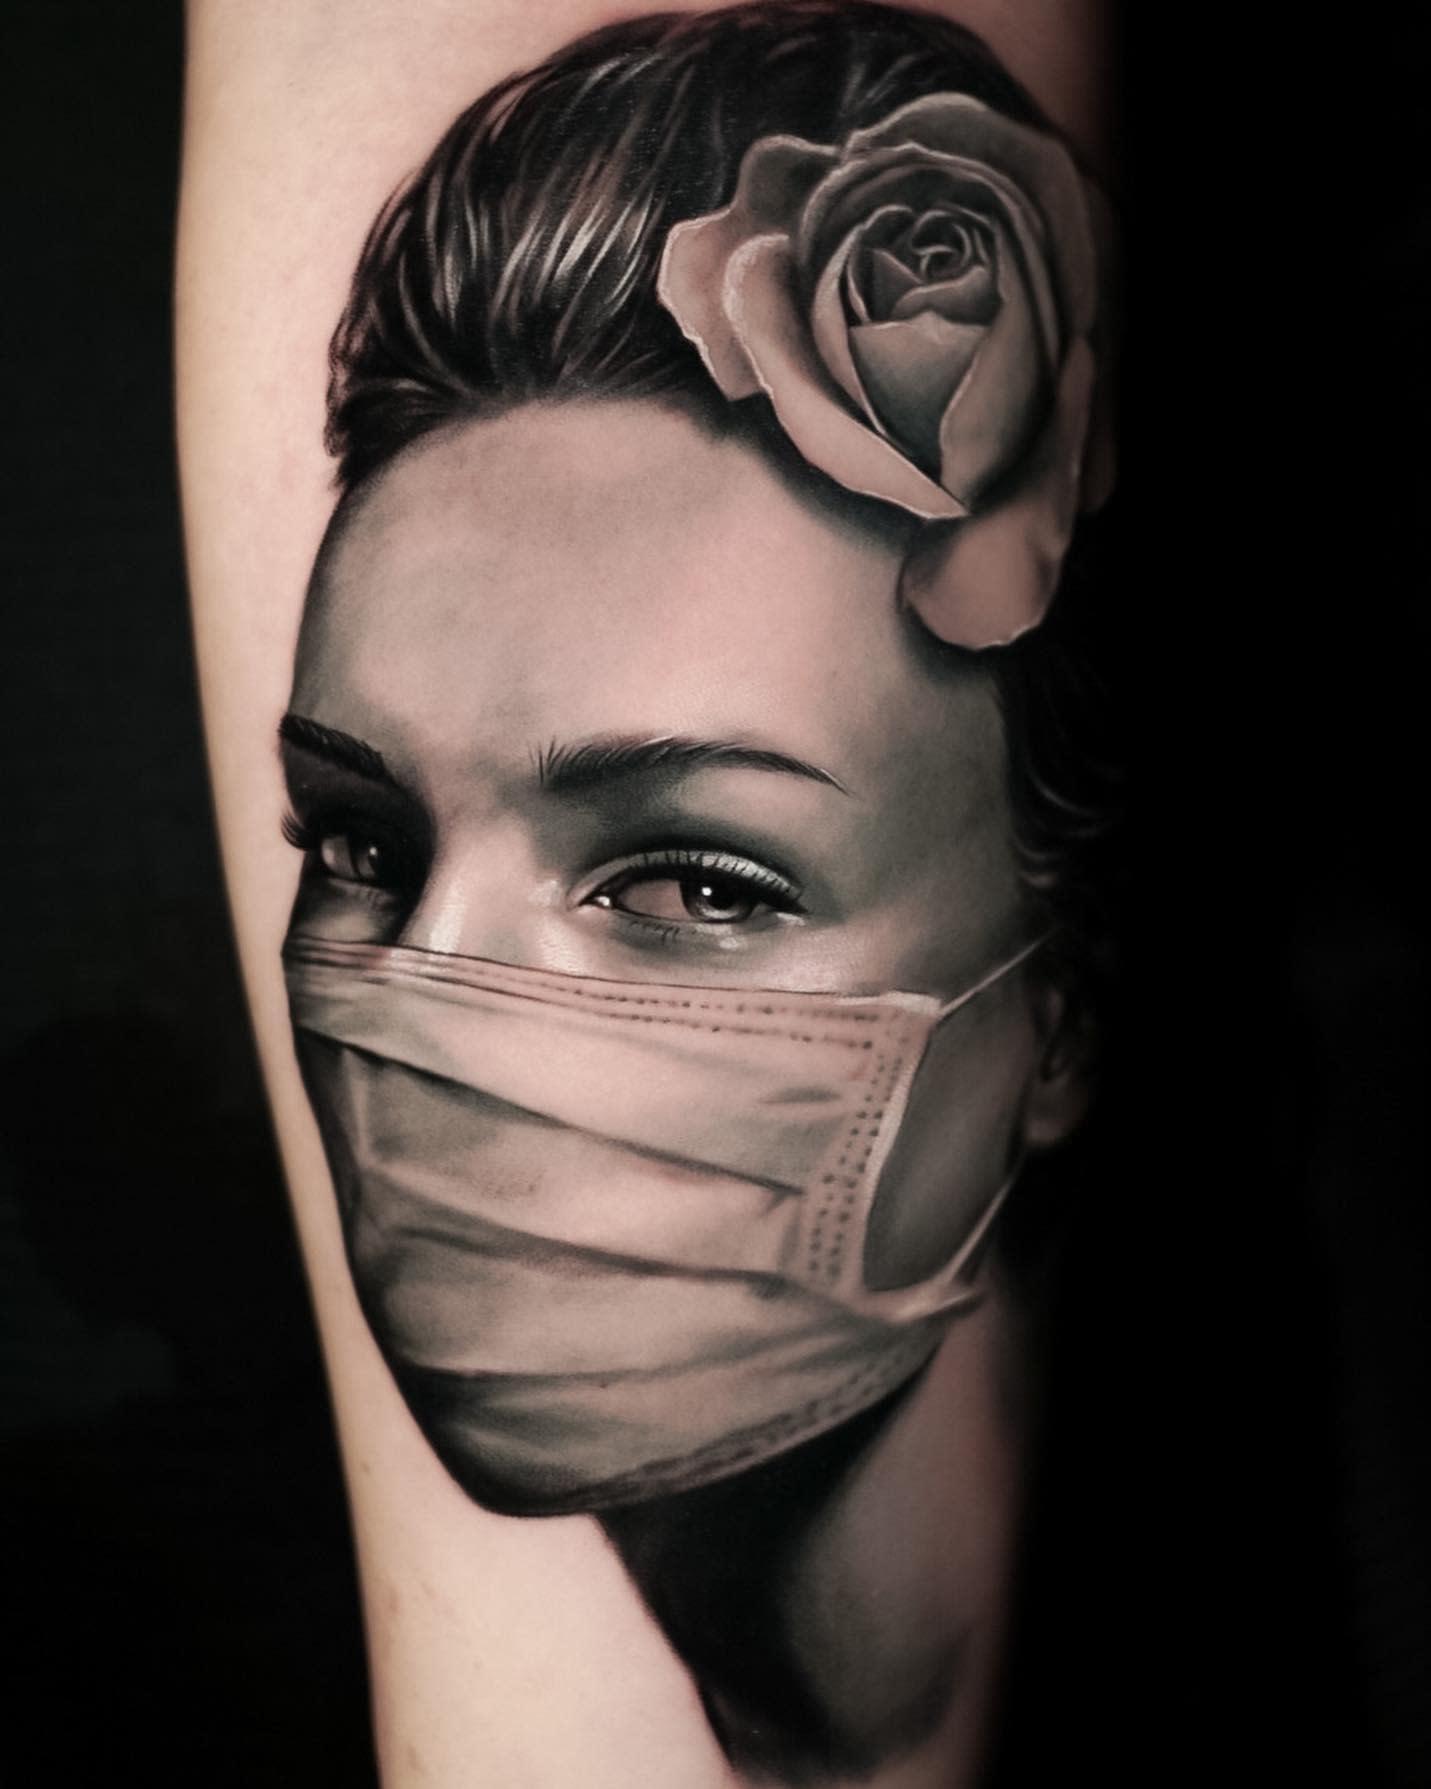 Facemask COVID Tattoo -robbieflaviani